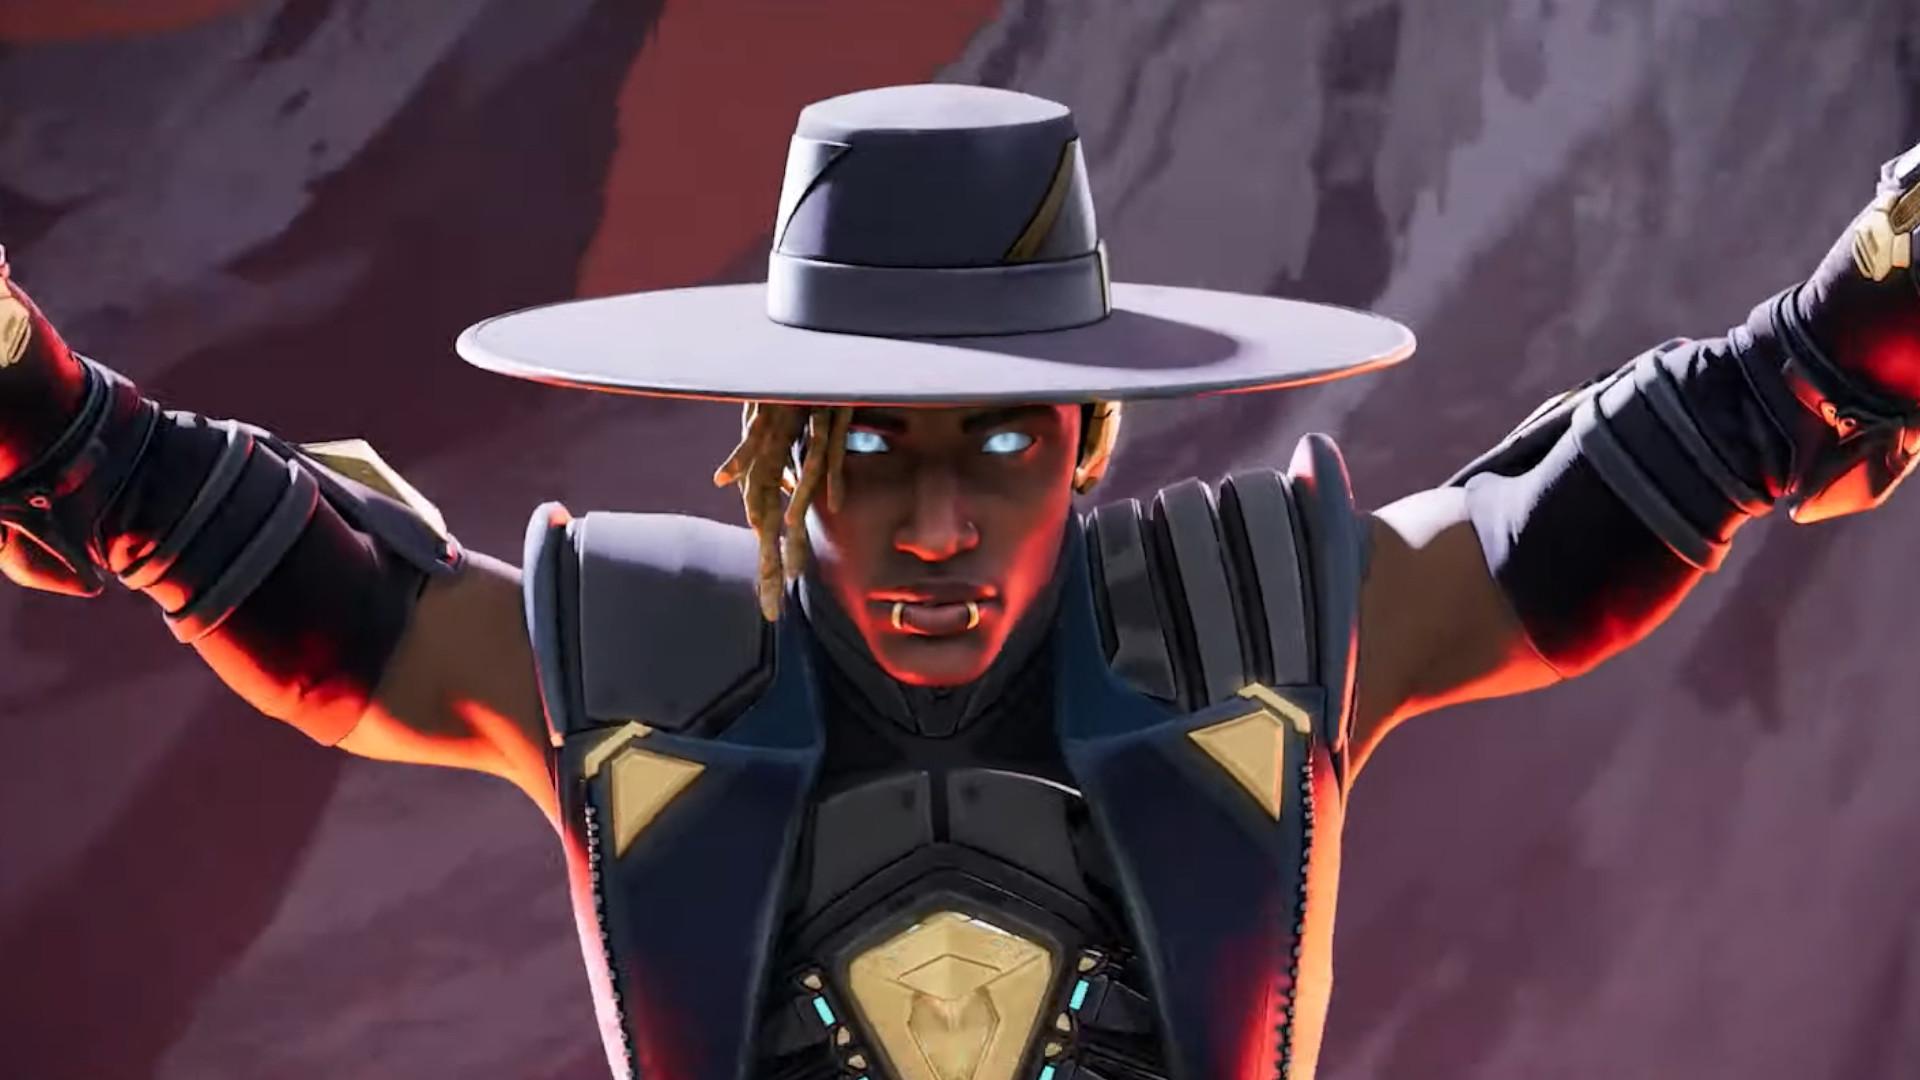 Apex Legends devs detail Seer's abilities in full